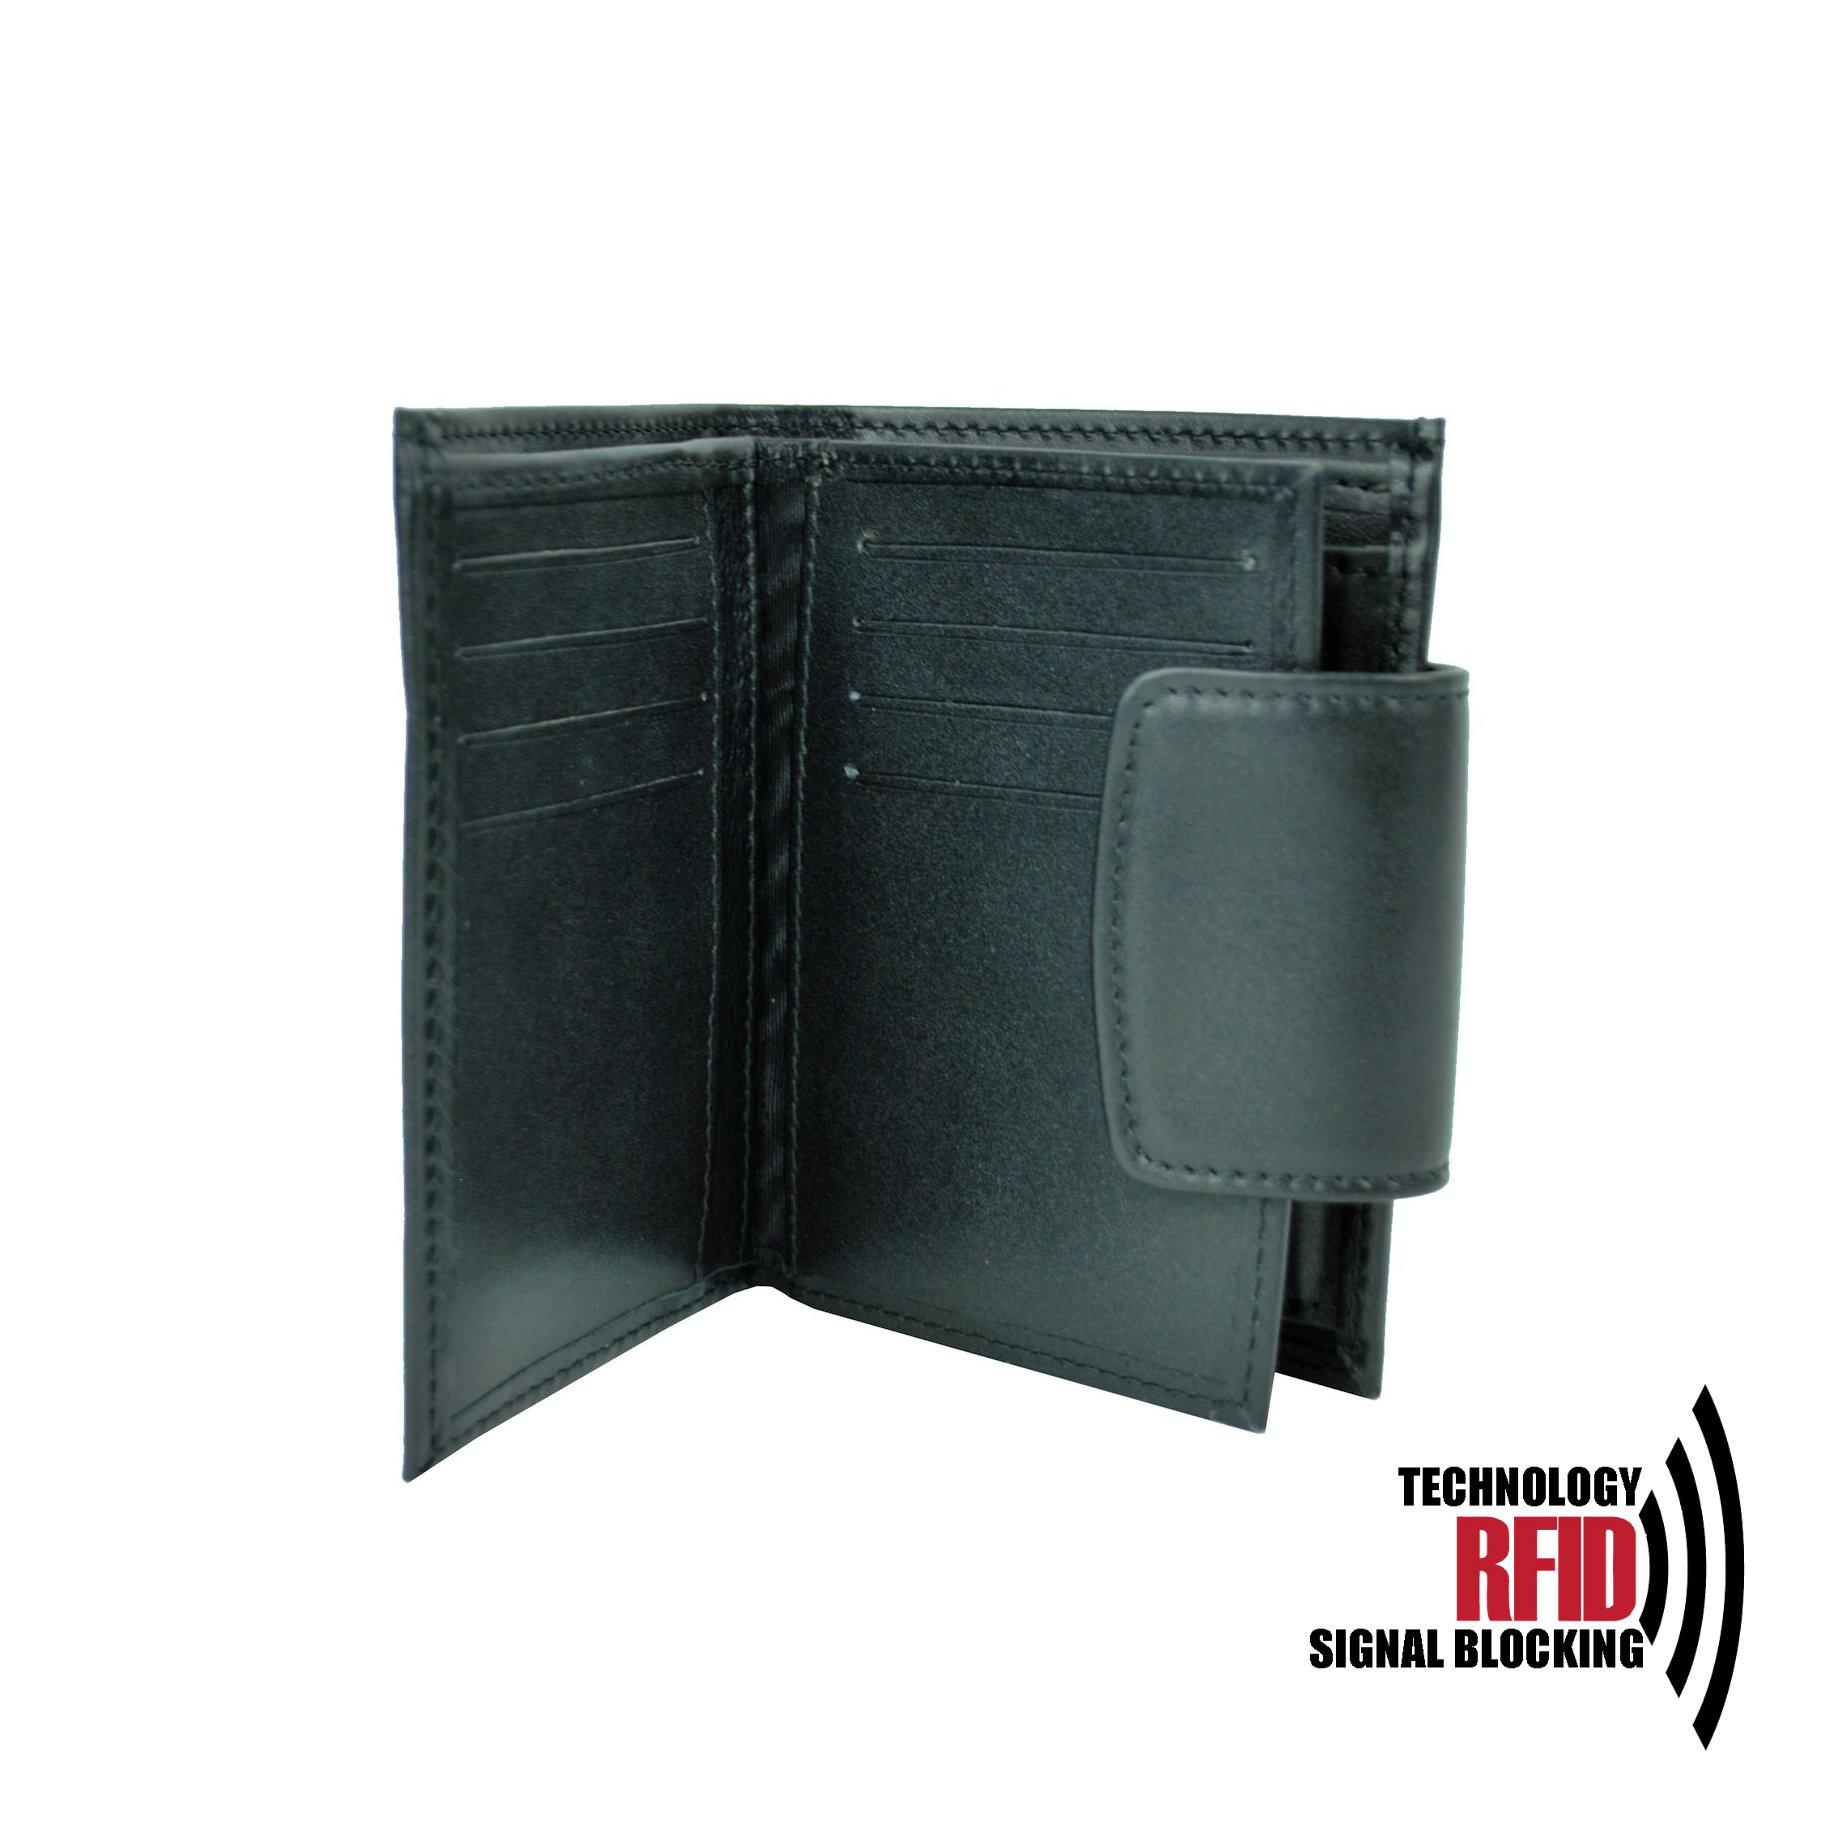 aaa39244d Kožená RFID peňaženka vybavená blokáciou RFID / NFC